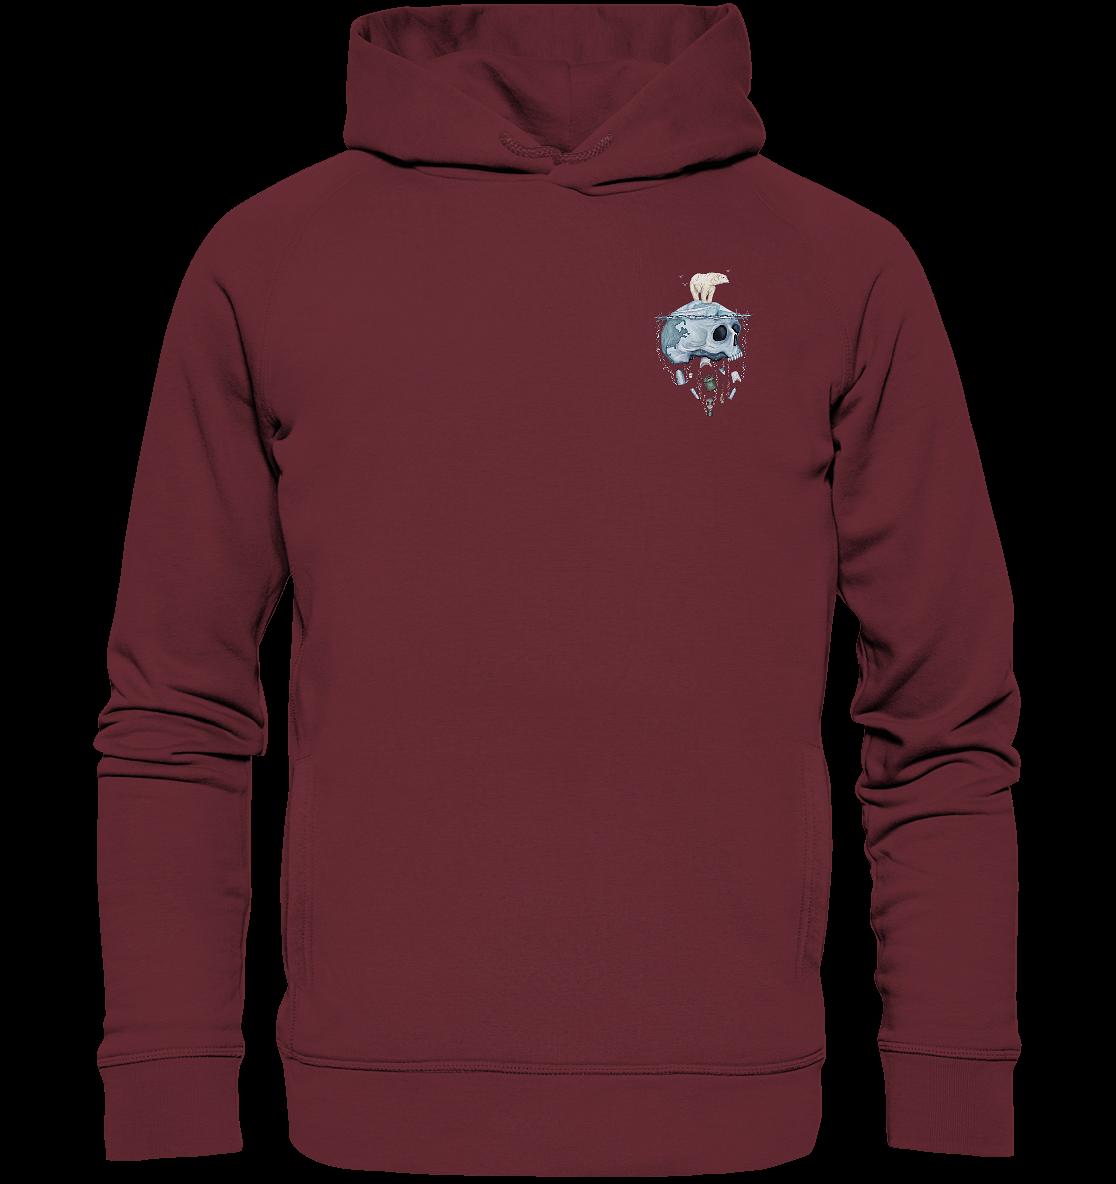 front-organic-fashion-hoodie-672b34-1116x.png